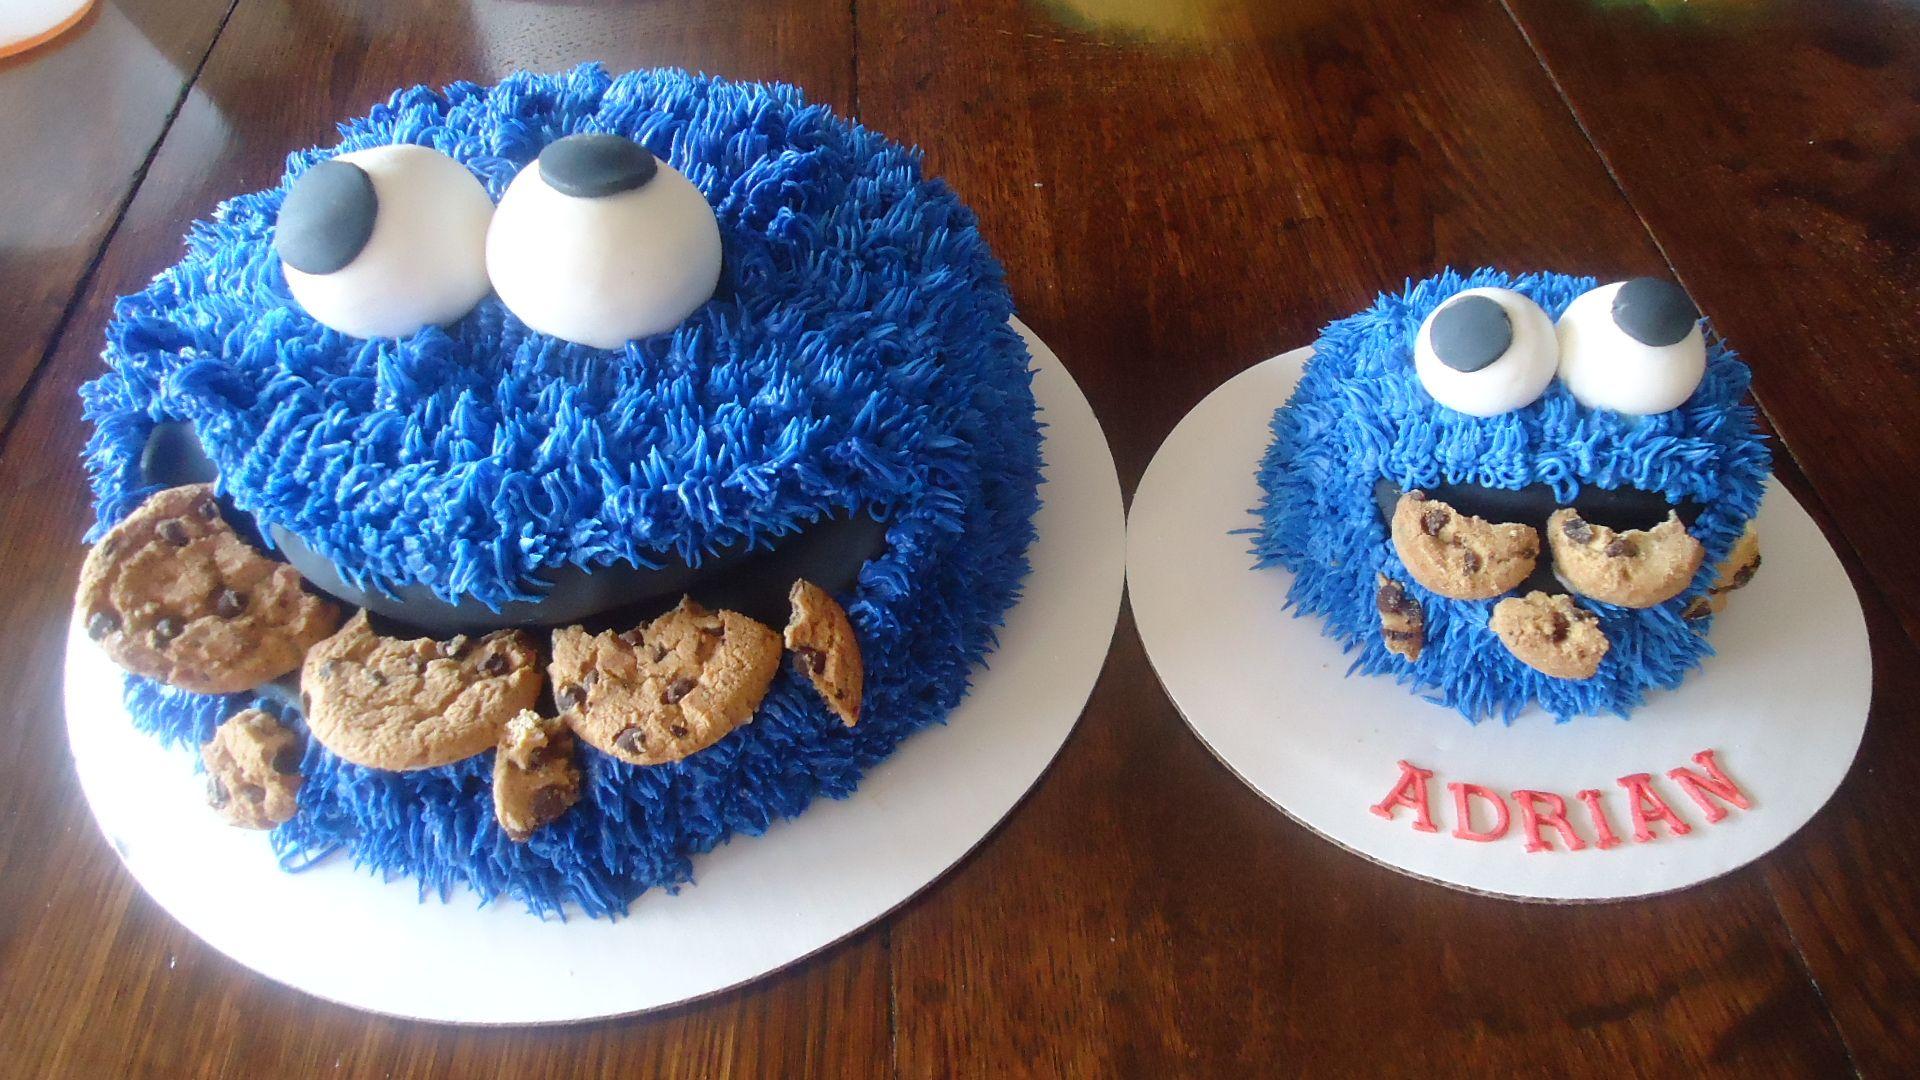 Cookie monster cakes cookies 1 year old birthday smash